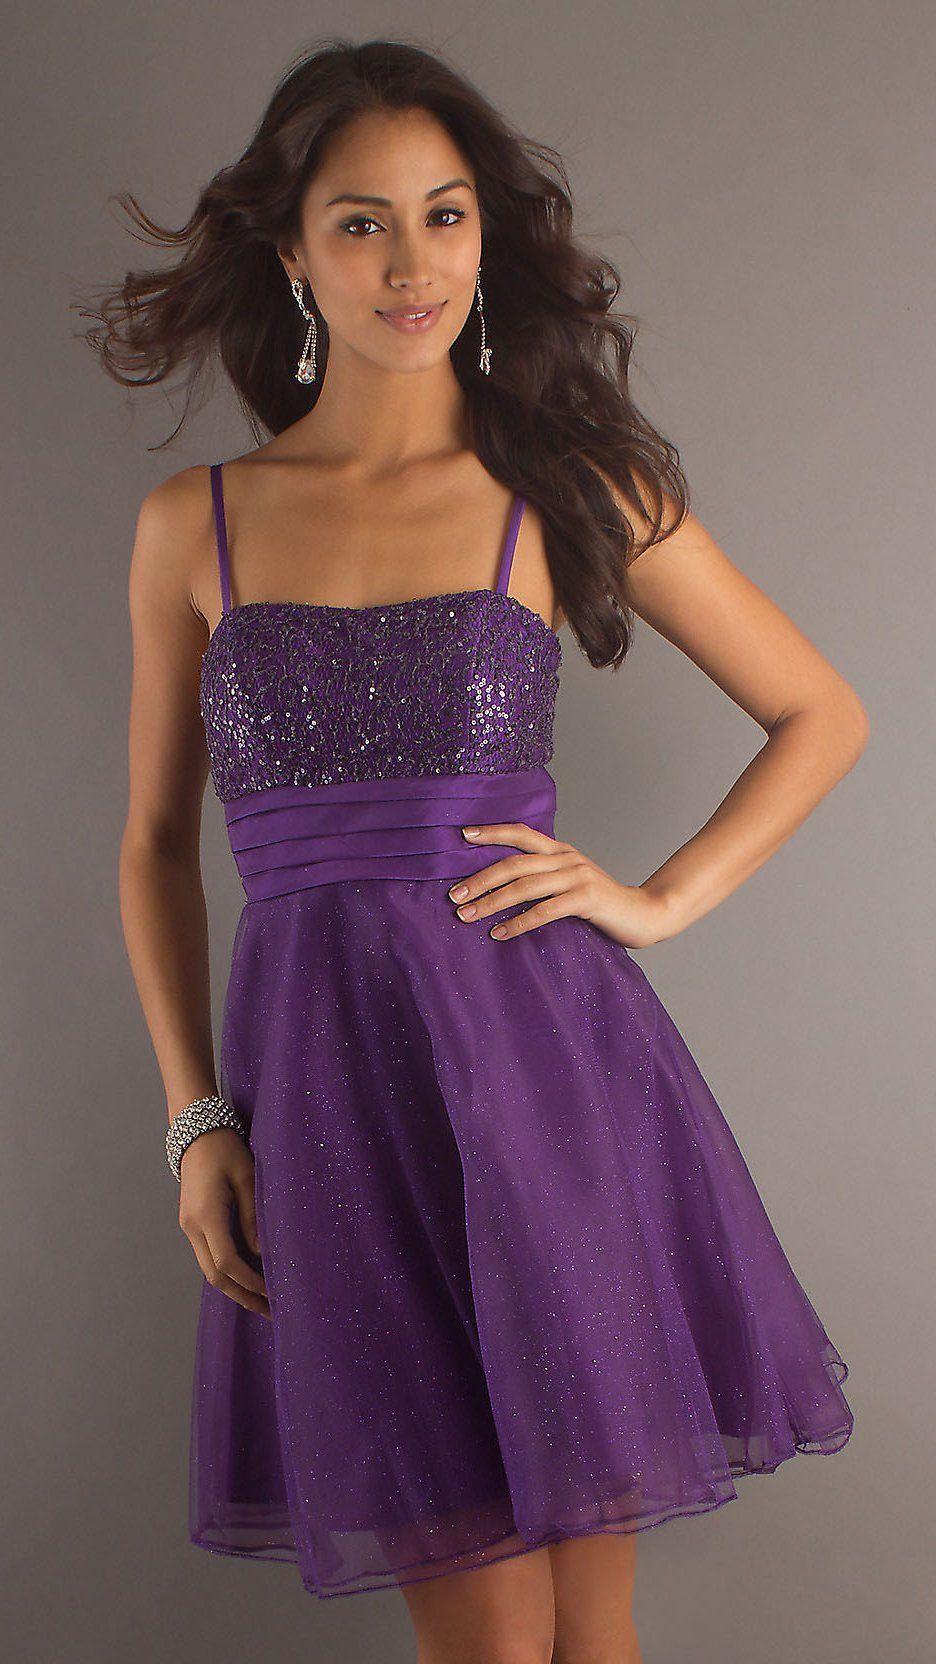 Short Purple Dama Dress Spaghetti Strap A Line Skirt Glitter $87.99 ...